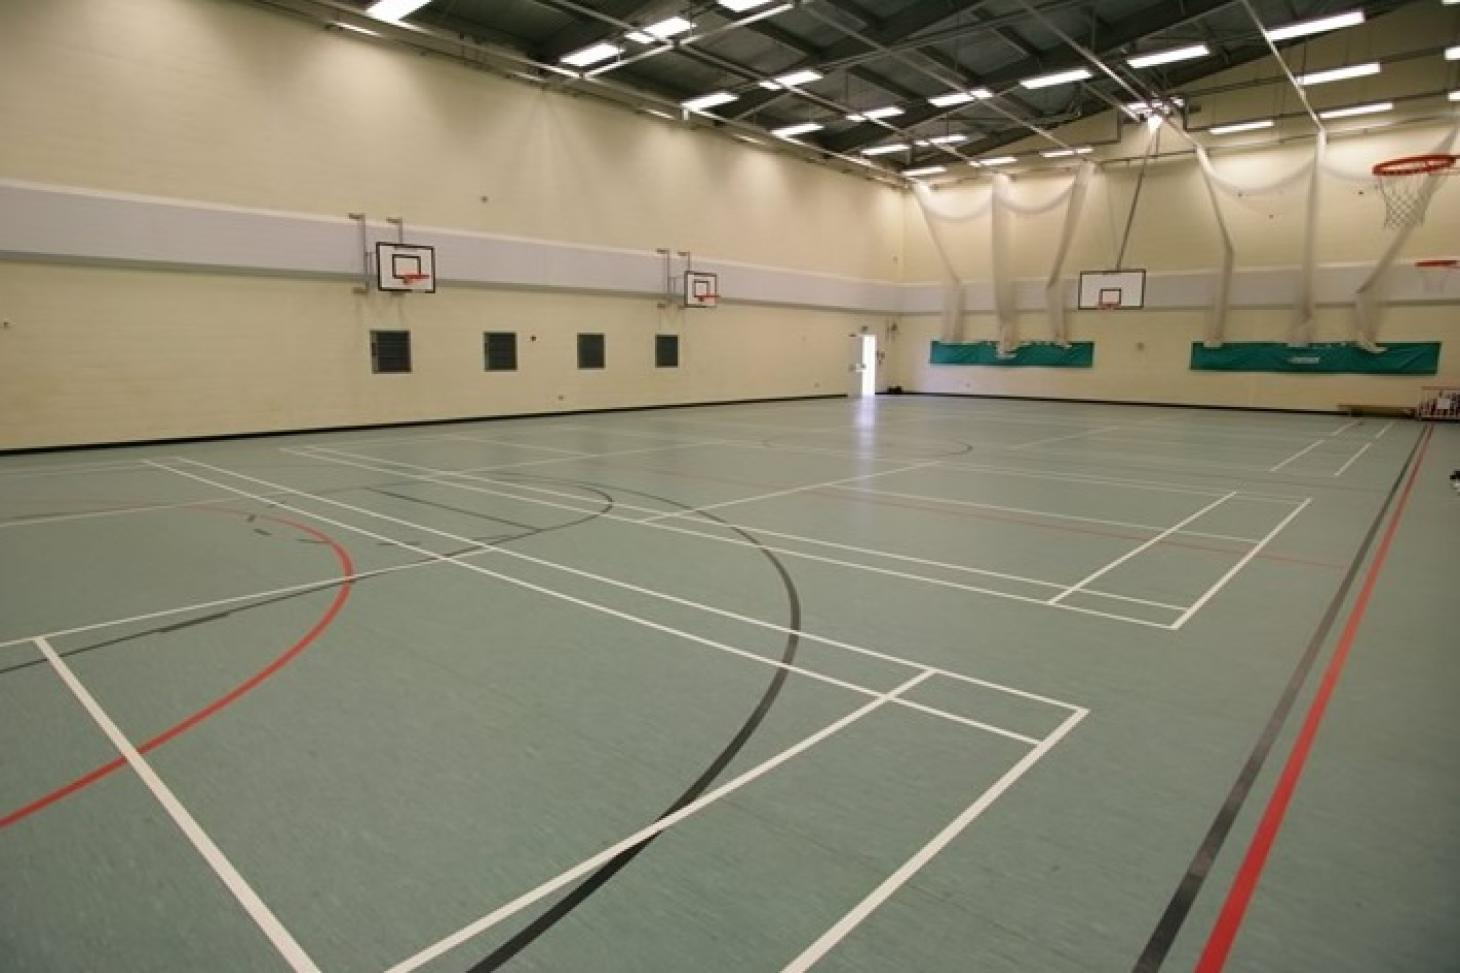 Denbigh High School Indoor   Hard badminton court